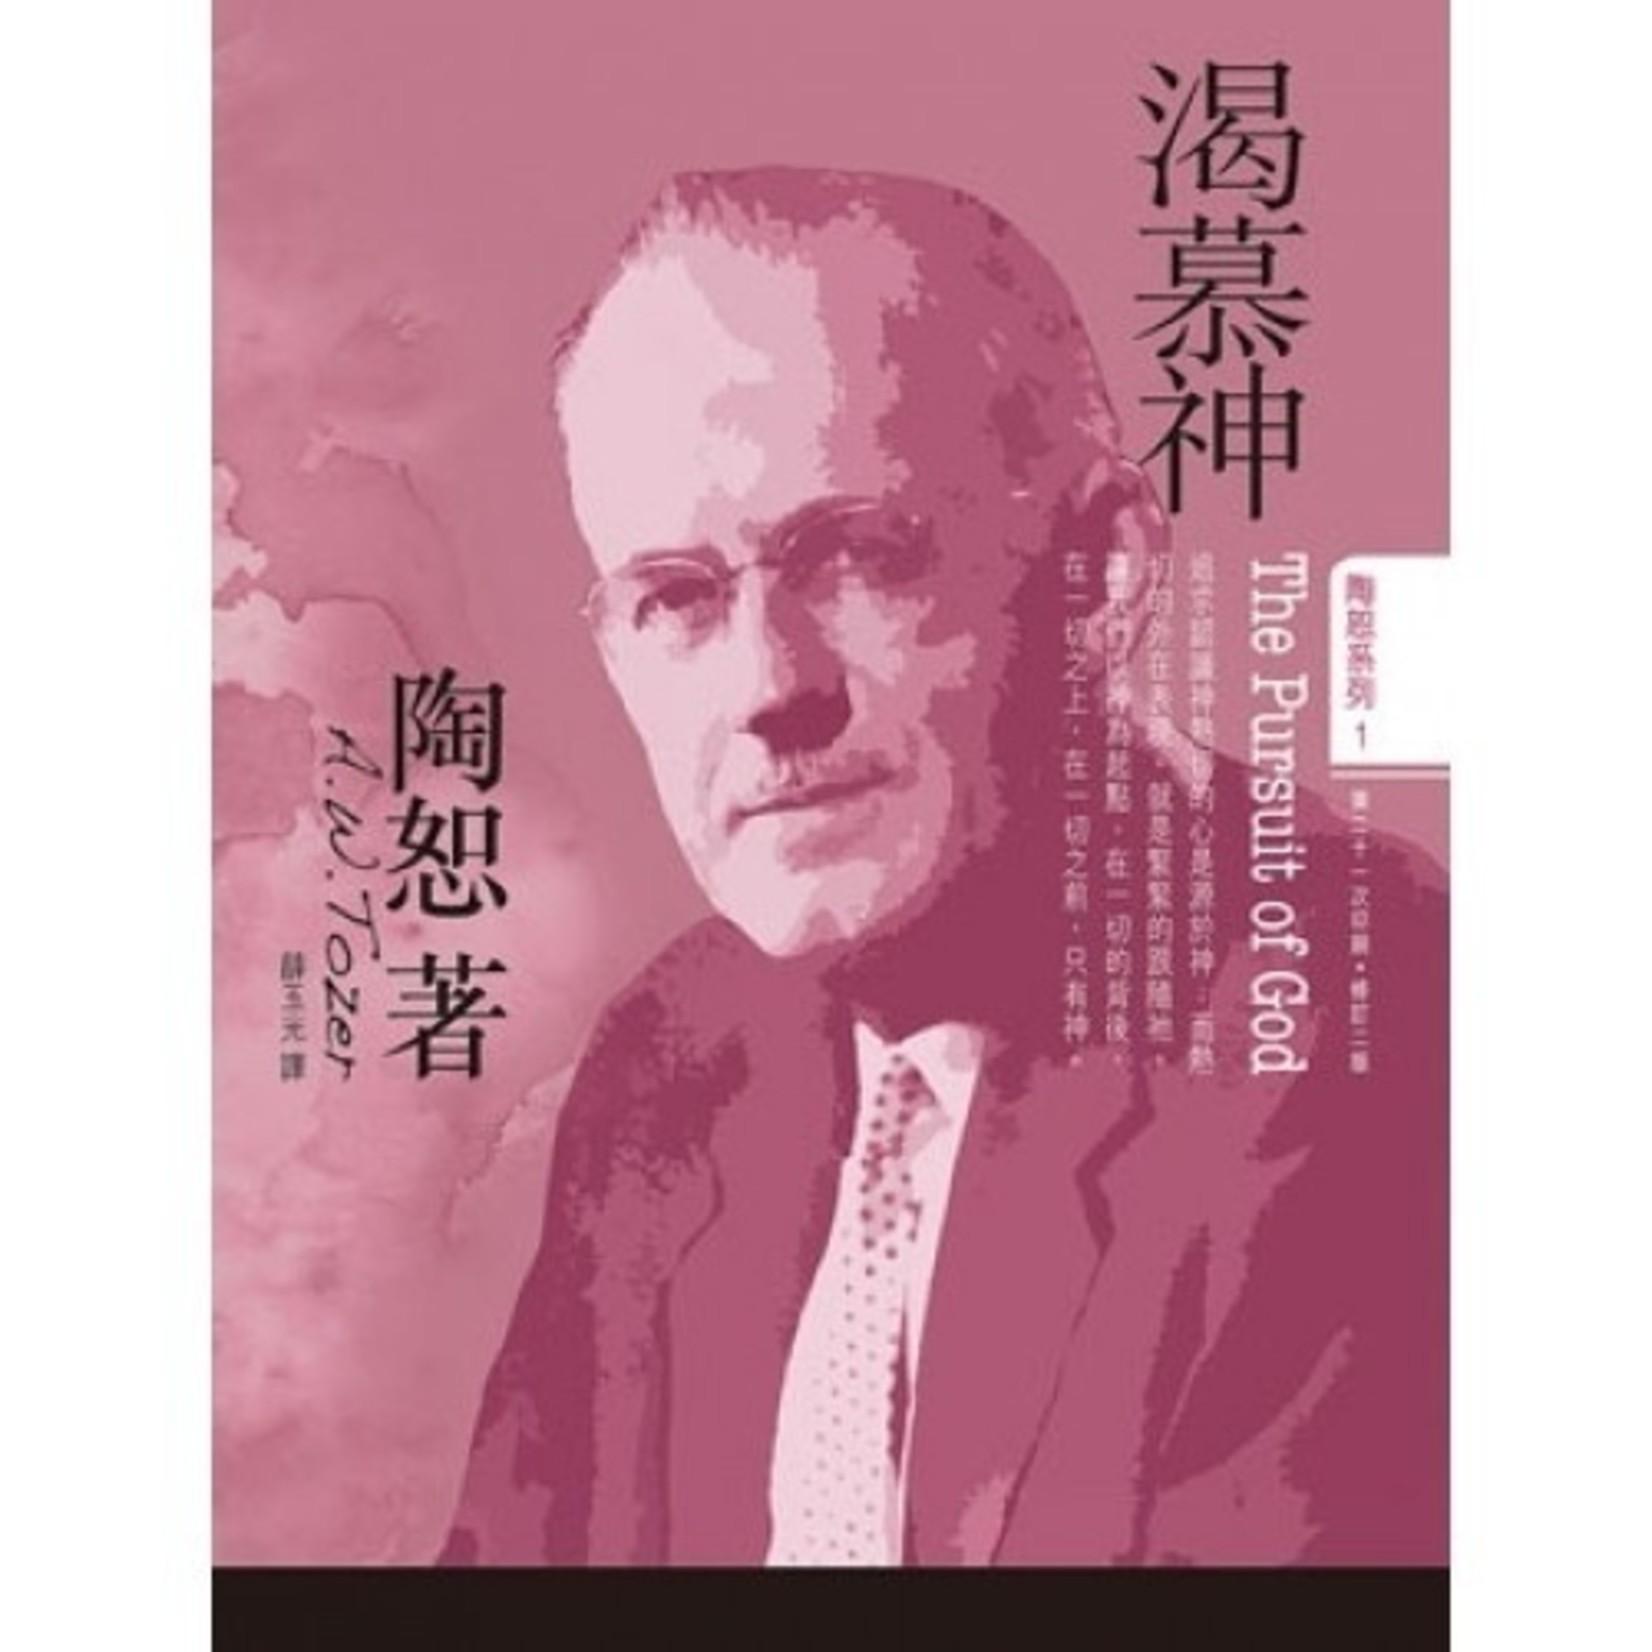 宣道 China Alliance Press 陶恕系列01:渴慕神(修訂二版)  The Pursuit of God